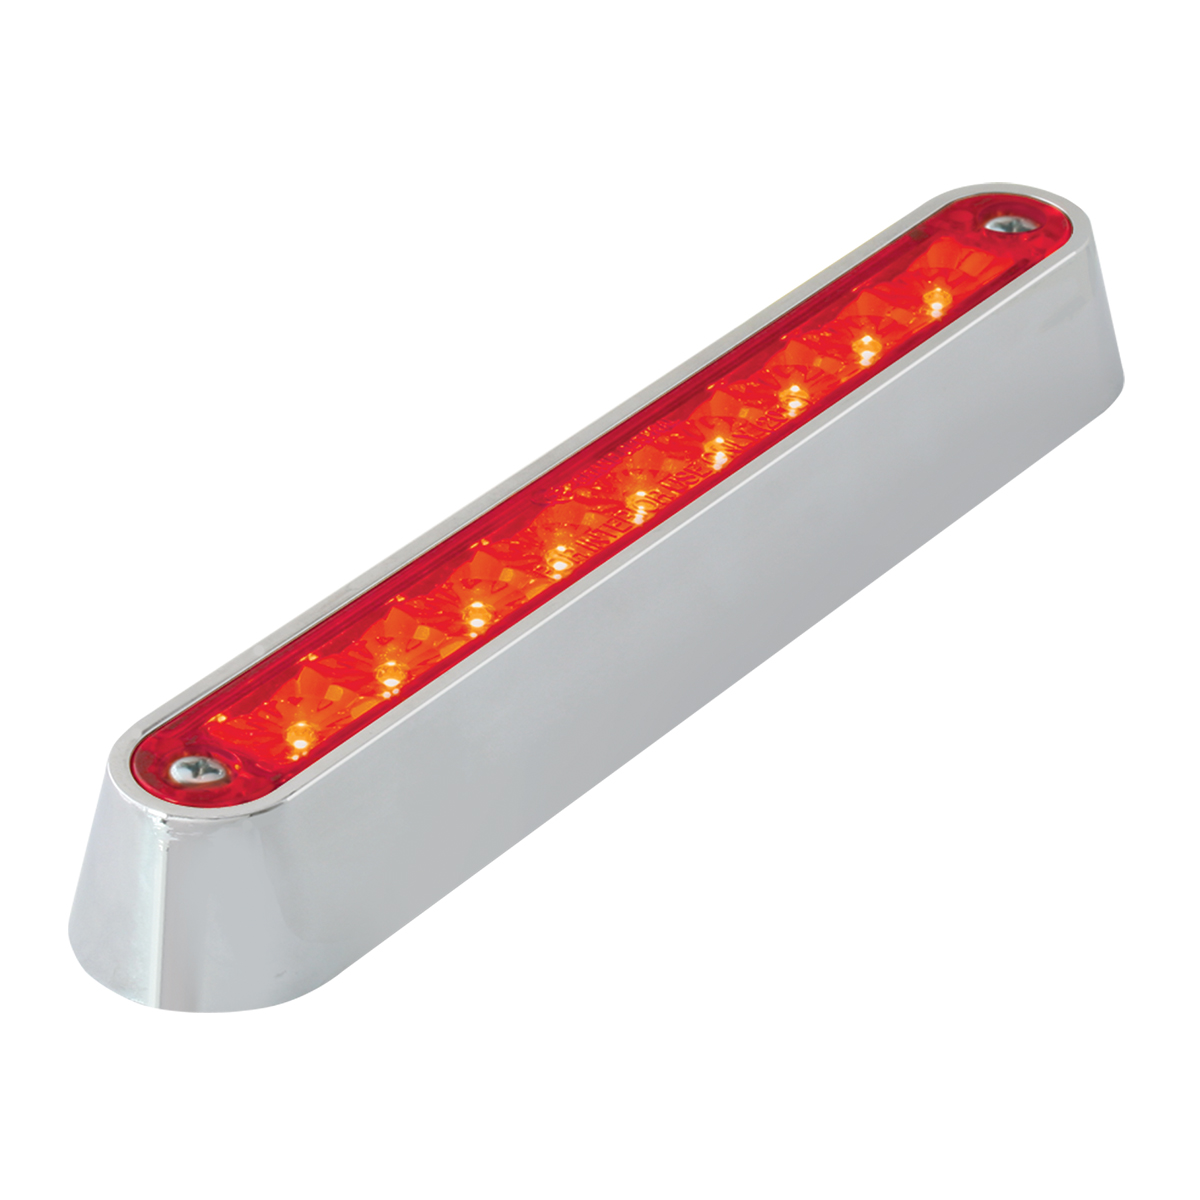 "76092 6.5"" Surface Mount LED Light Bar w/ Chrome Plastic Base"